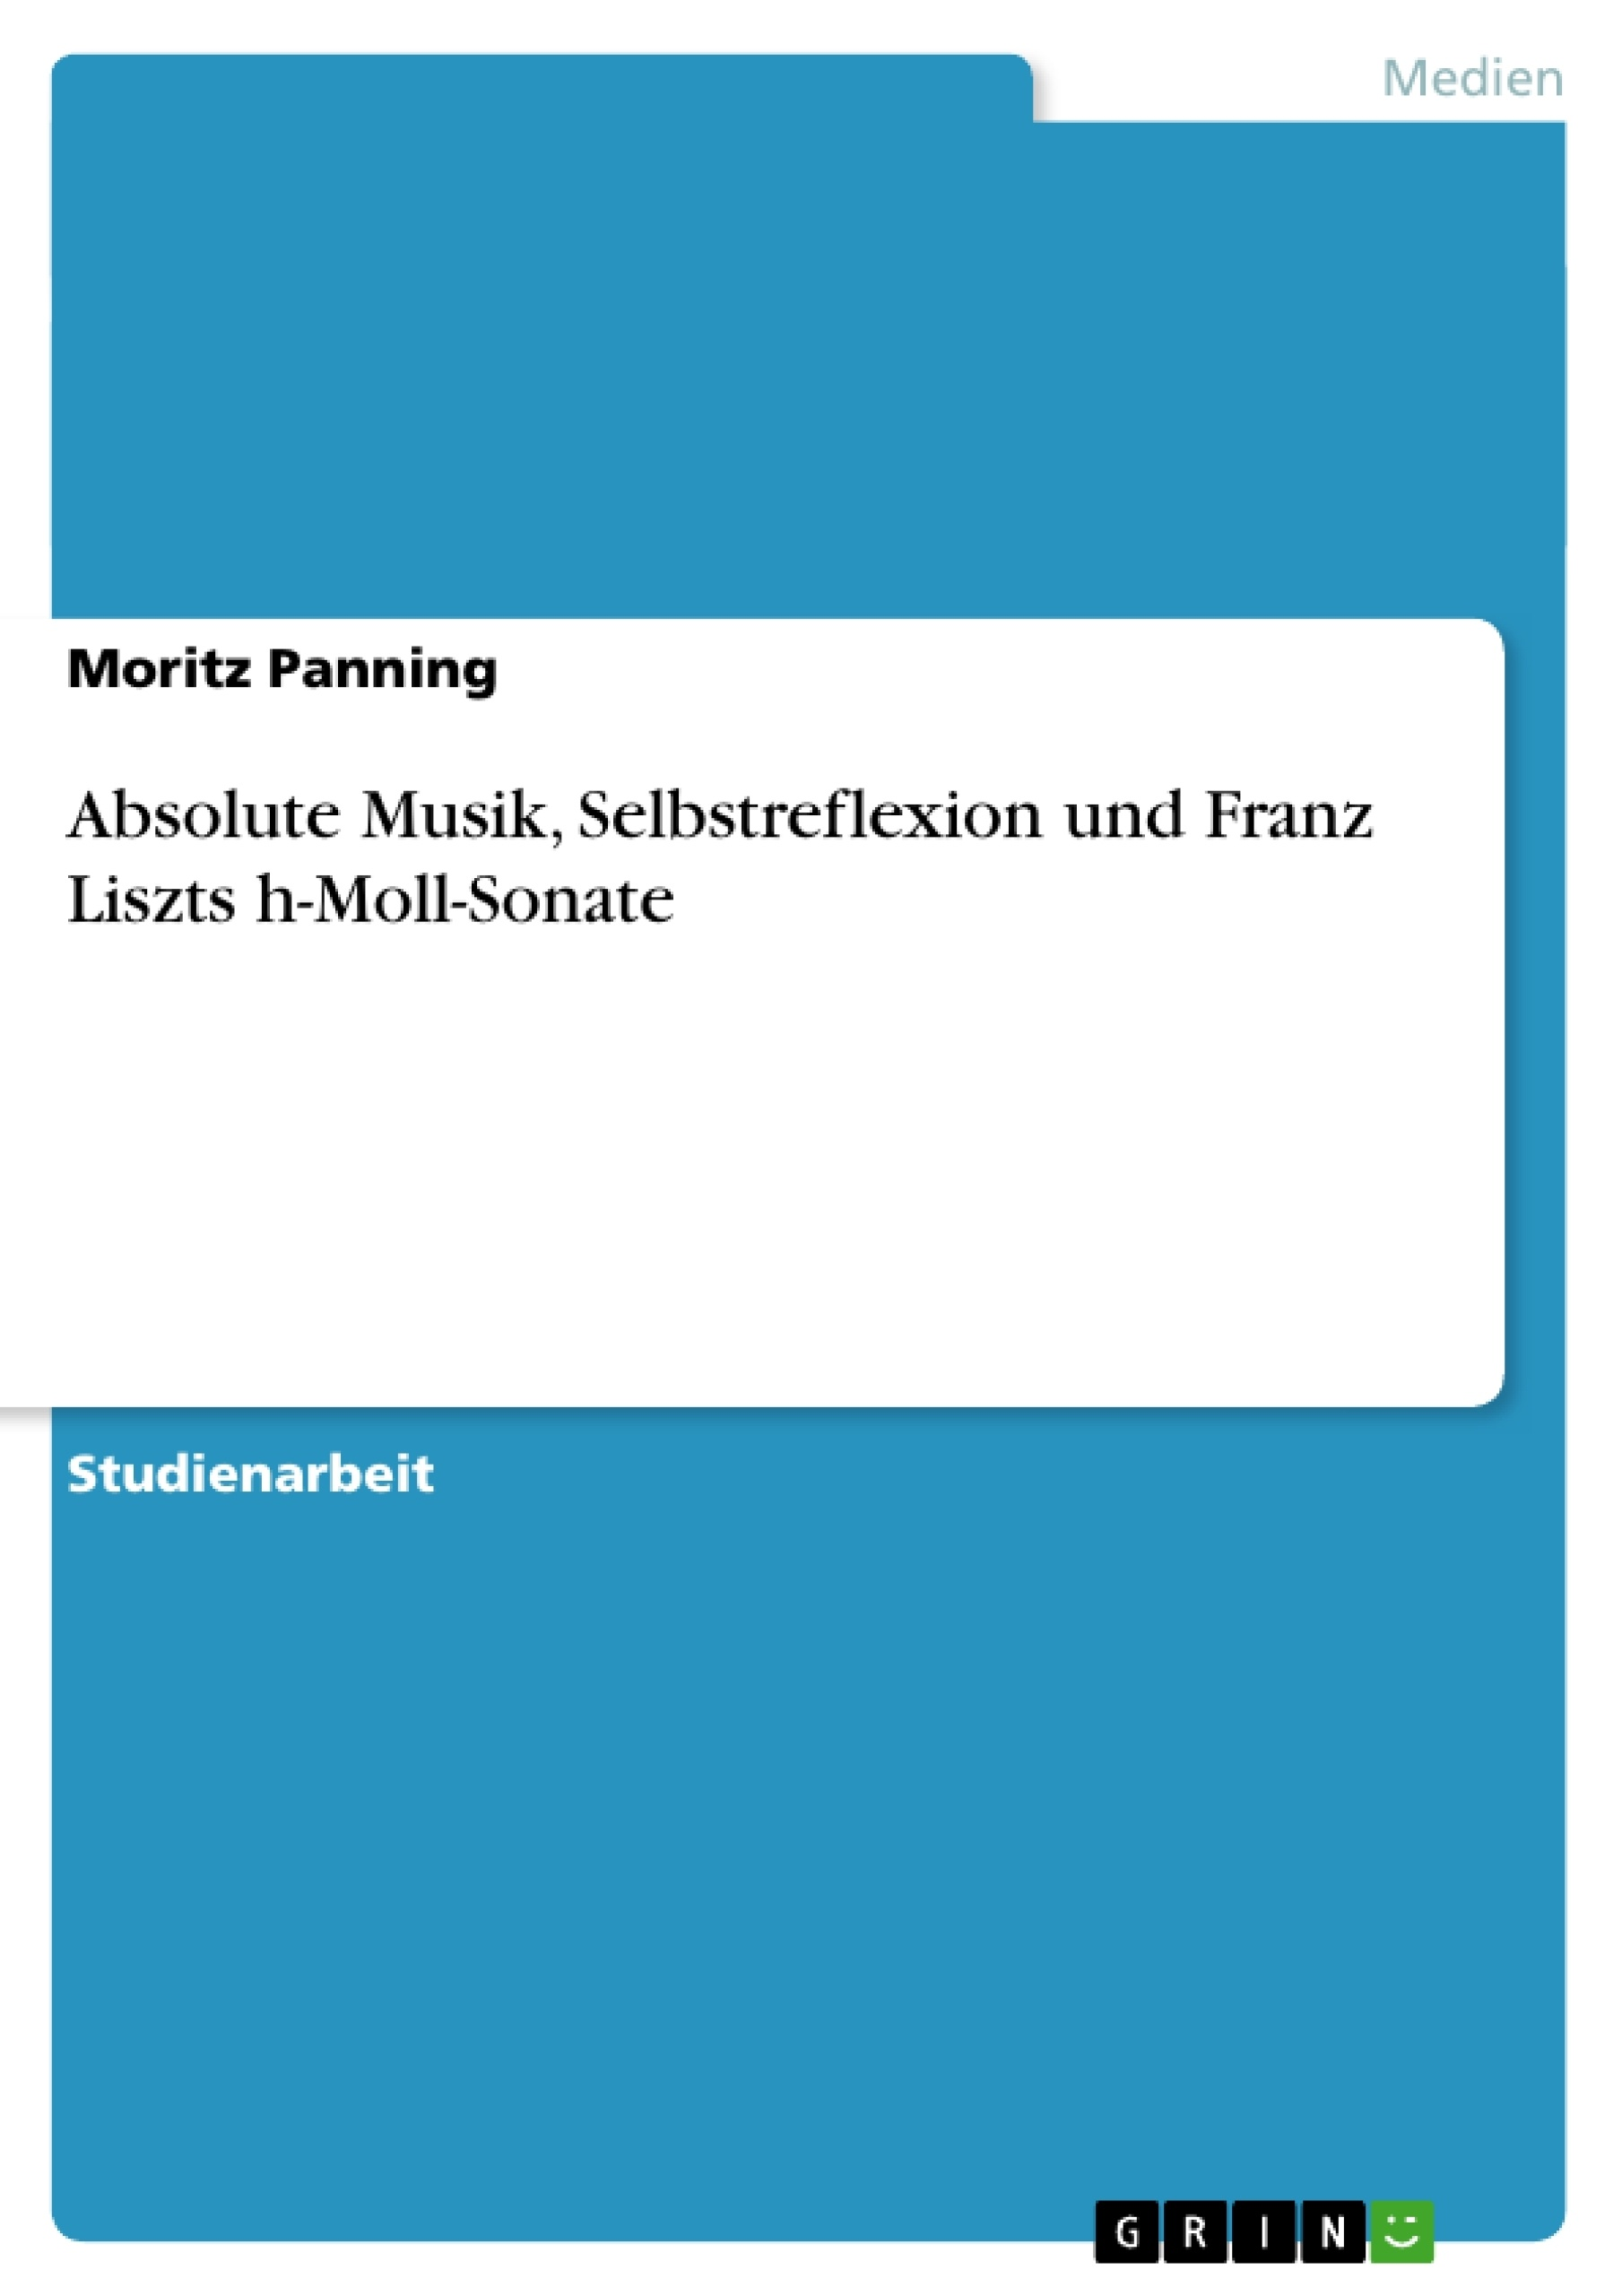 Titel: Absolute Musik, Selbstreflexion und Franz Liszts h-Moll-Sonate